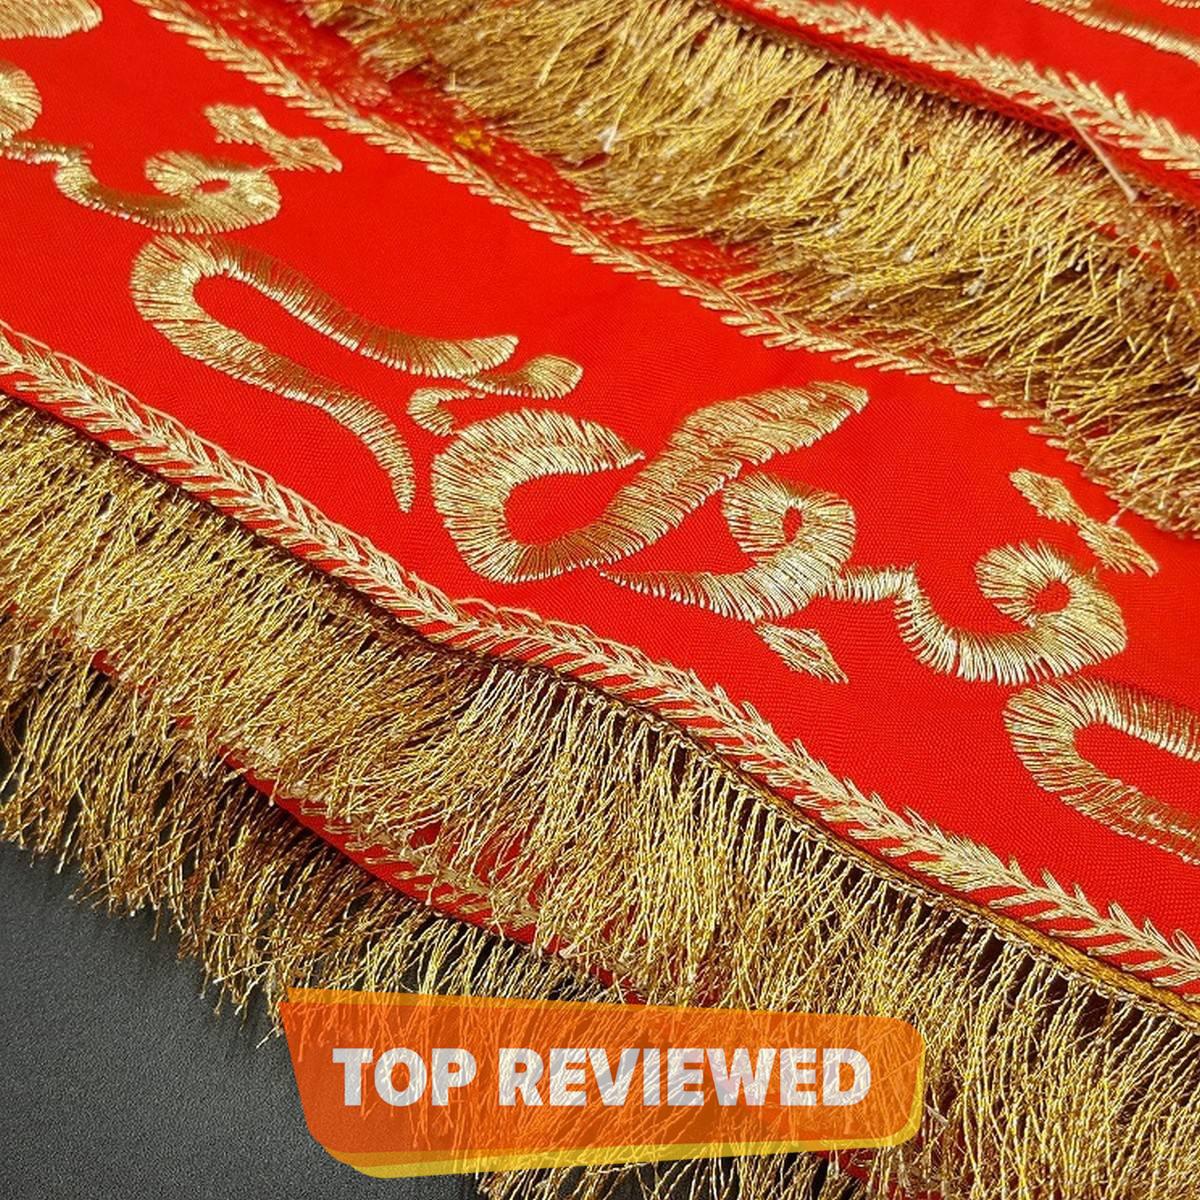 Qabool Hai Traditional Embroidery Bridal Dubata Net Fancy Dress Qubool Hai Dupatta without Name Shadi Mehndi Wedding Gift Nikah Event Nikkah Dupatta Accessories with Fine Tailored Stitch Lace Dupata For Girls Women